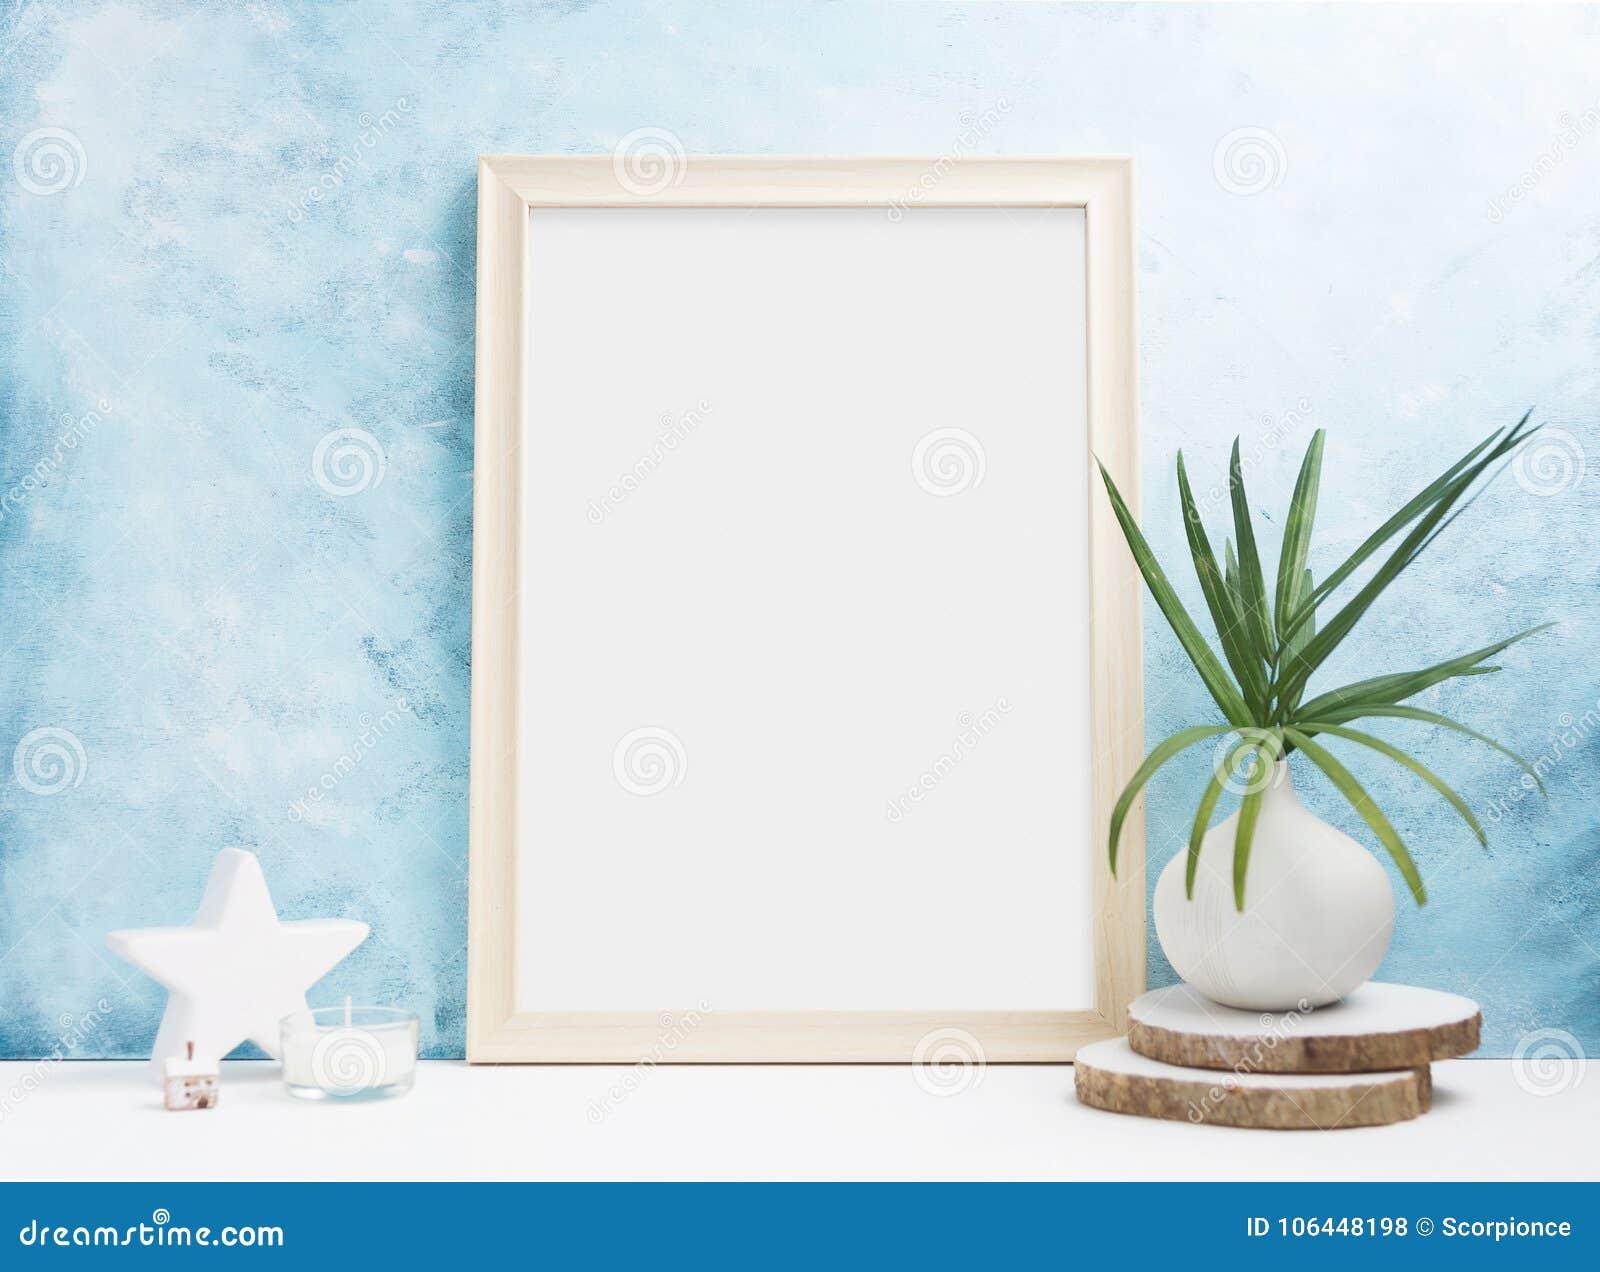 Vertical wooden Photo frame mock up with plants in vase, ceramic decor on shelf. Scandinavian style